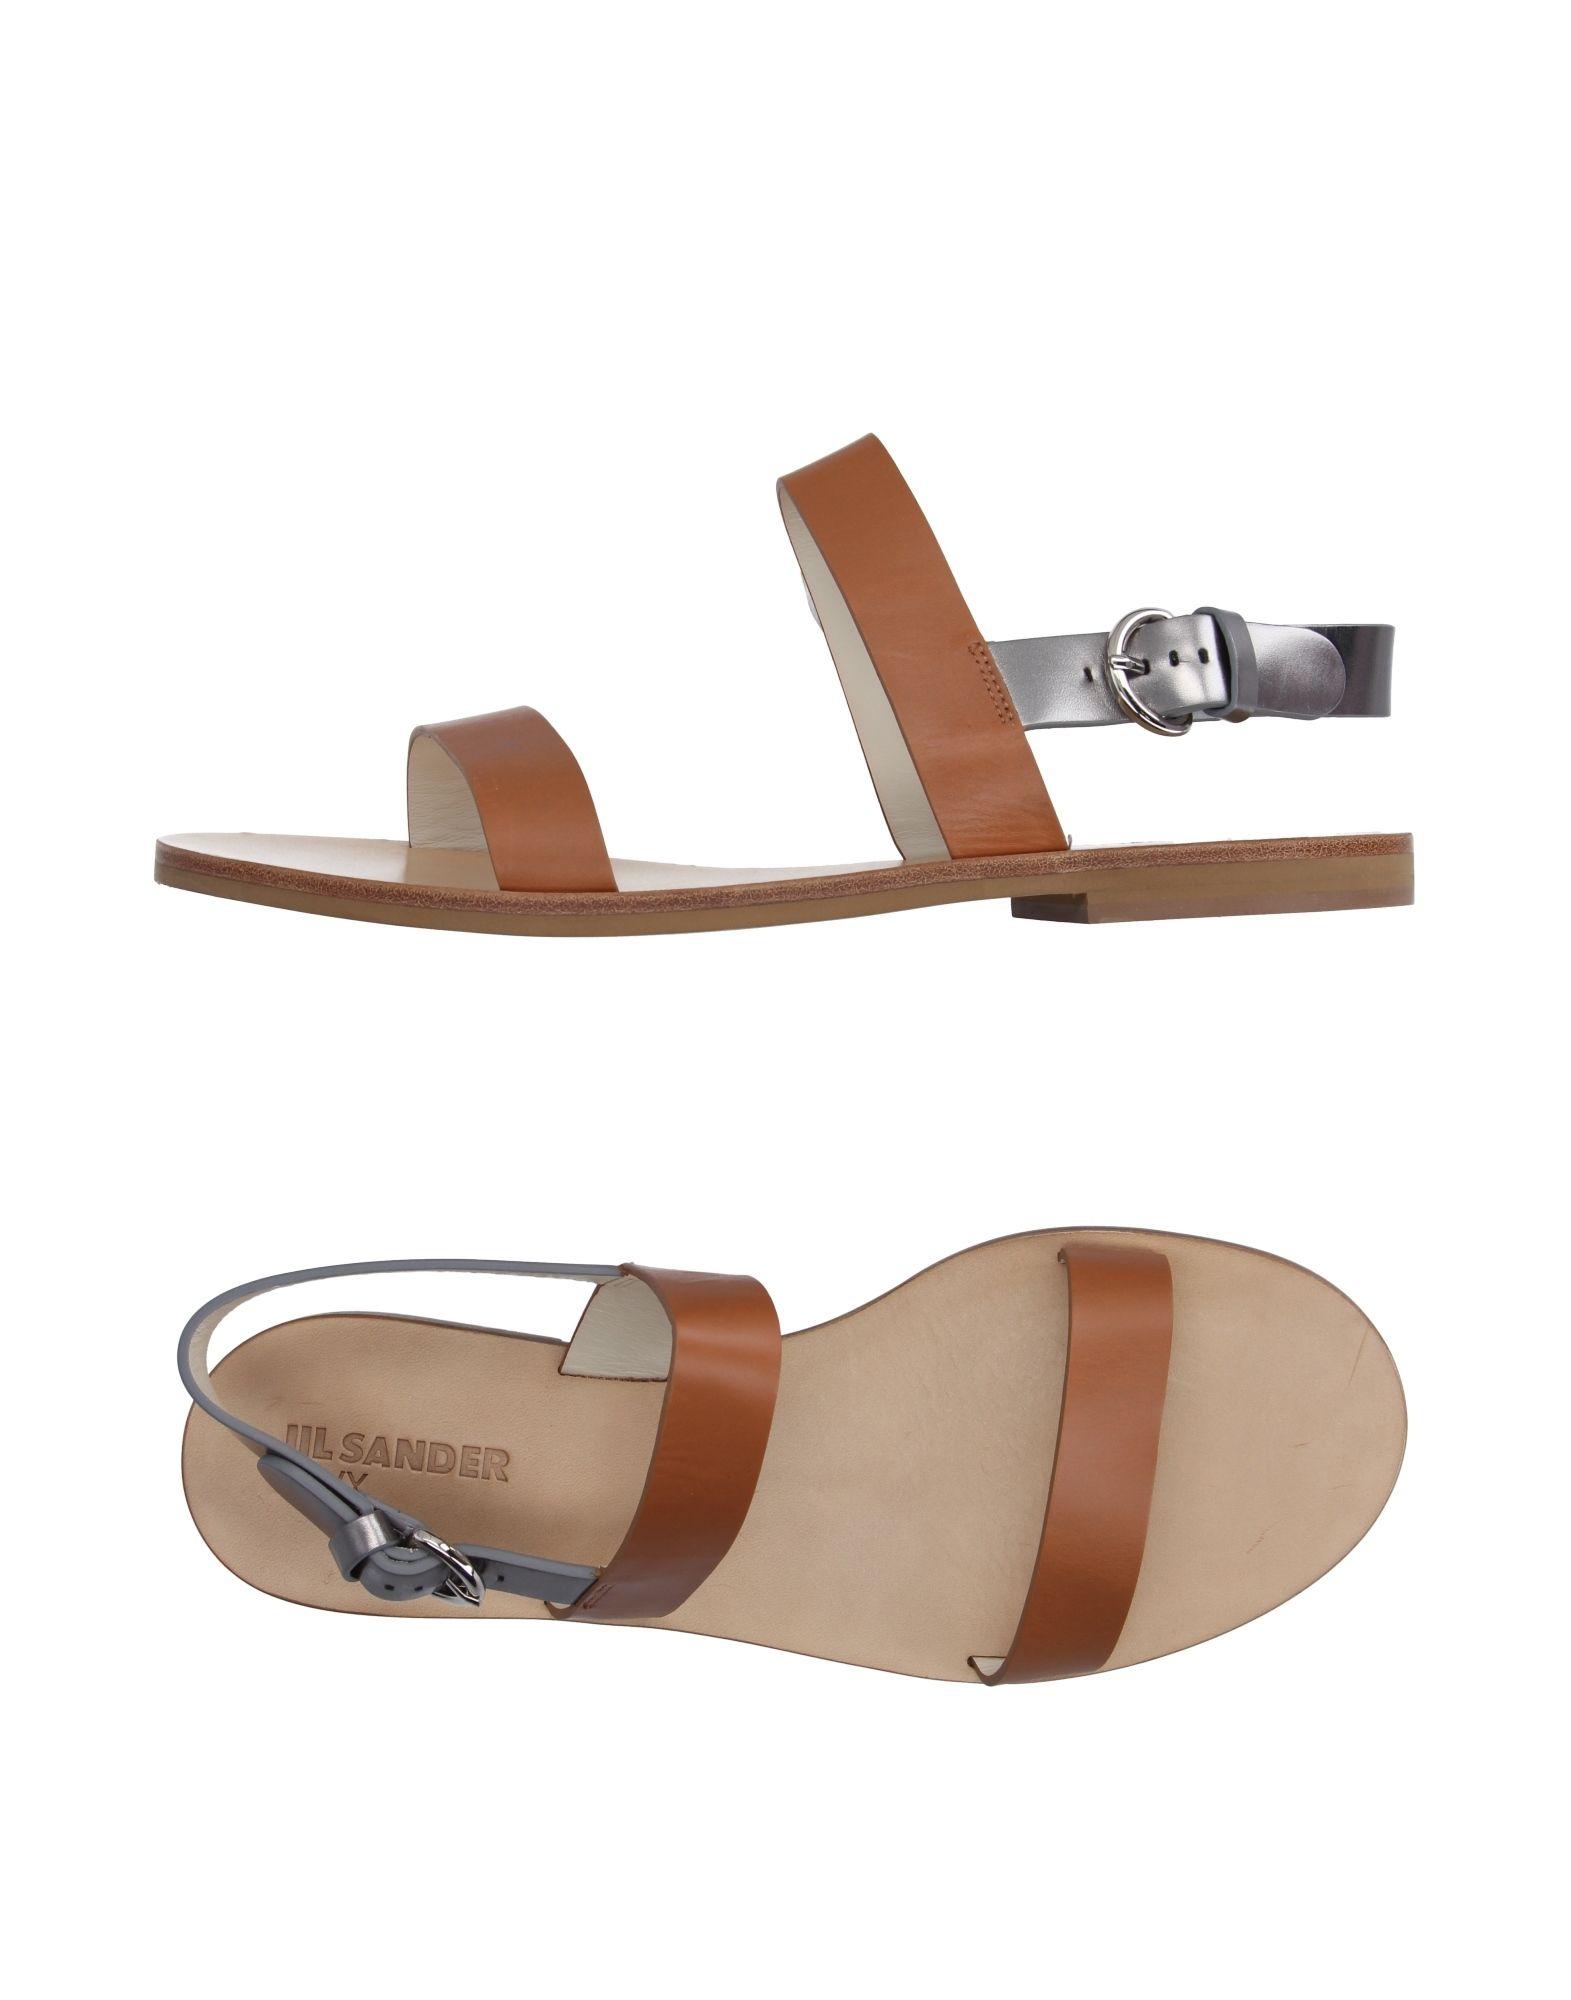 Jil Sander Navy Sandalen Damen  11193961RJ Neue Schuhe